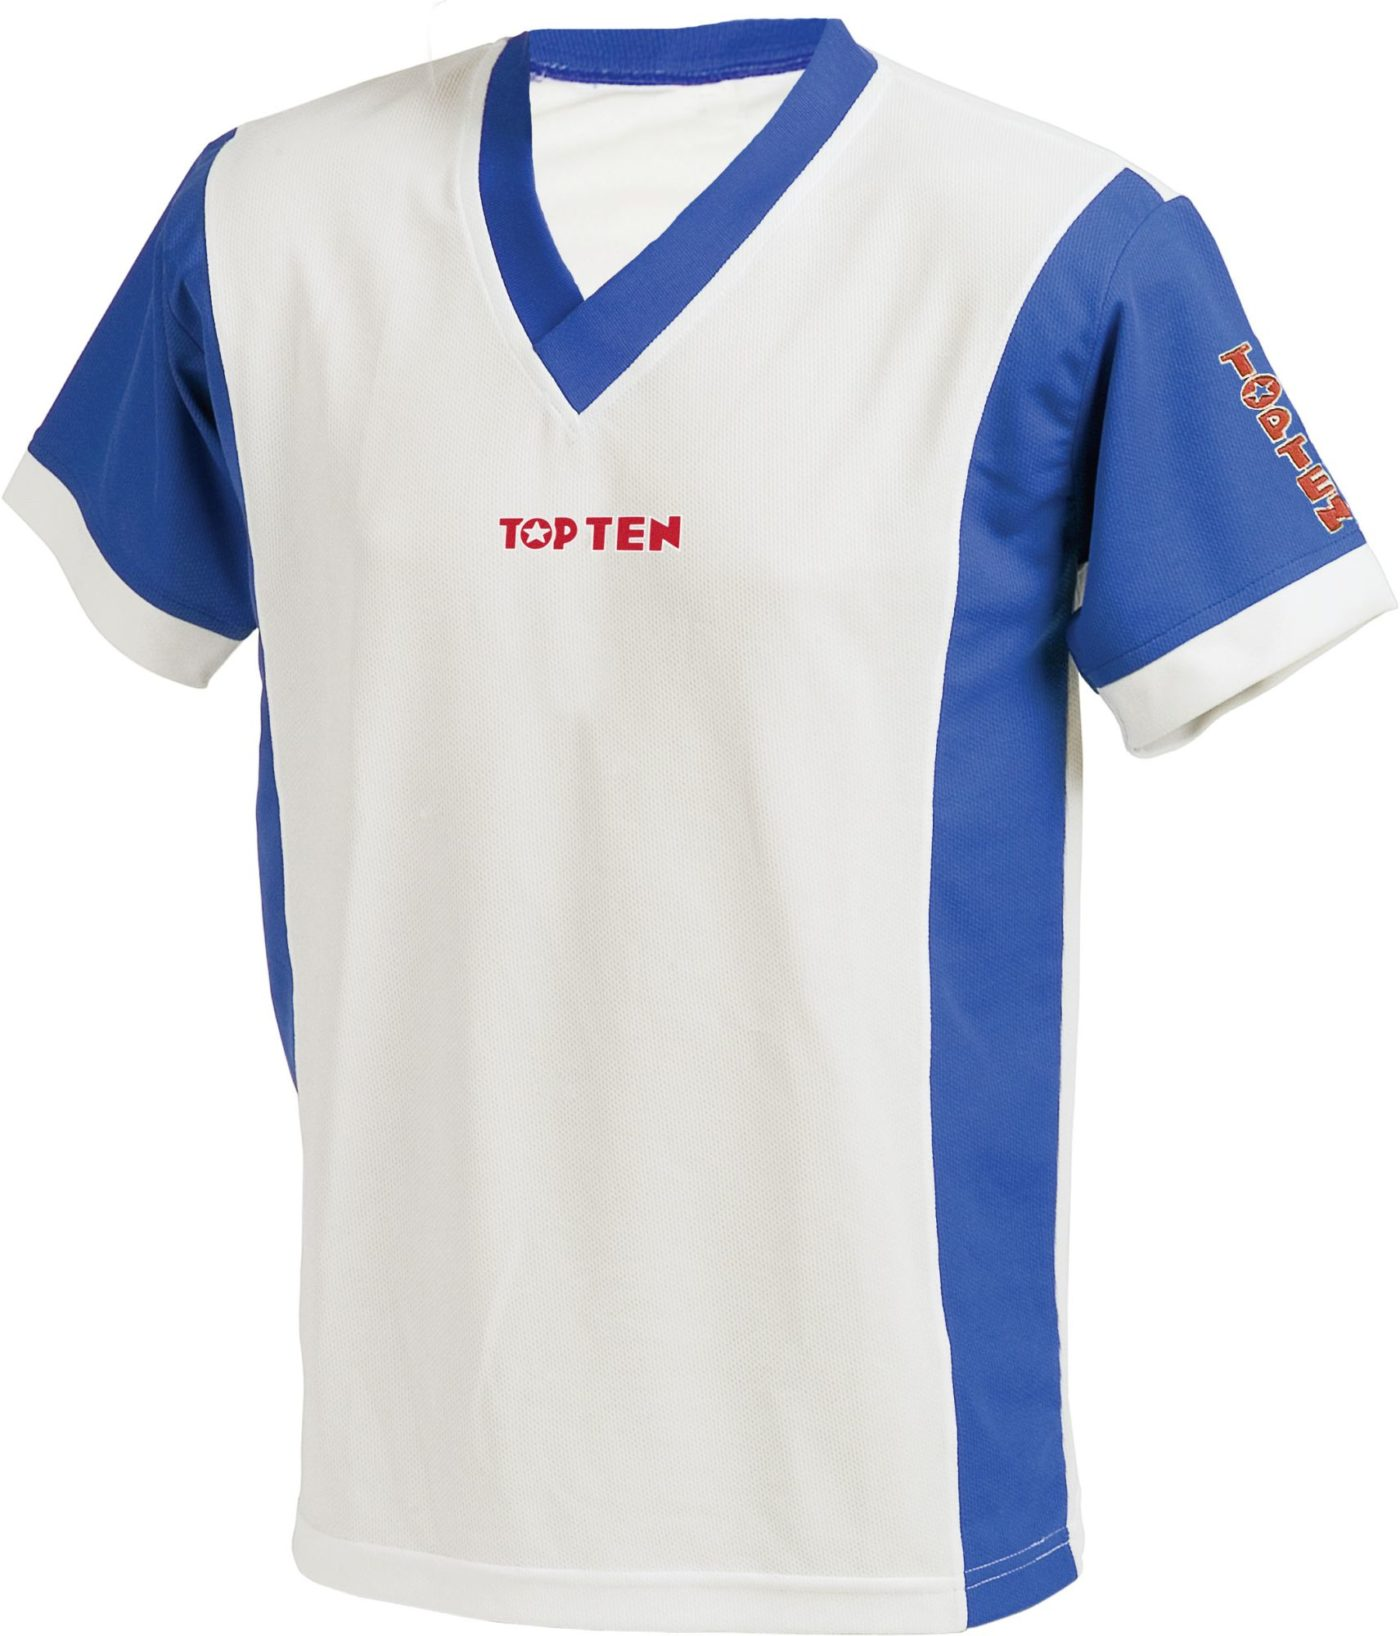 "TOP TEN T-Shirt V-Hals ""UNISEX"" Wit - Blauw"